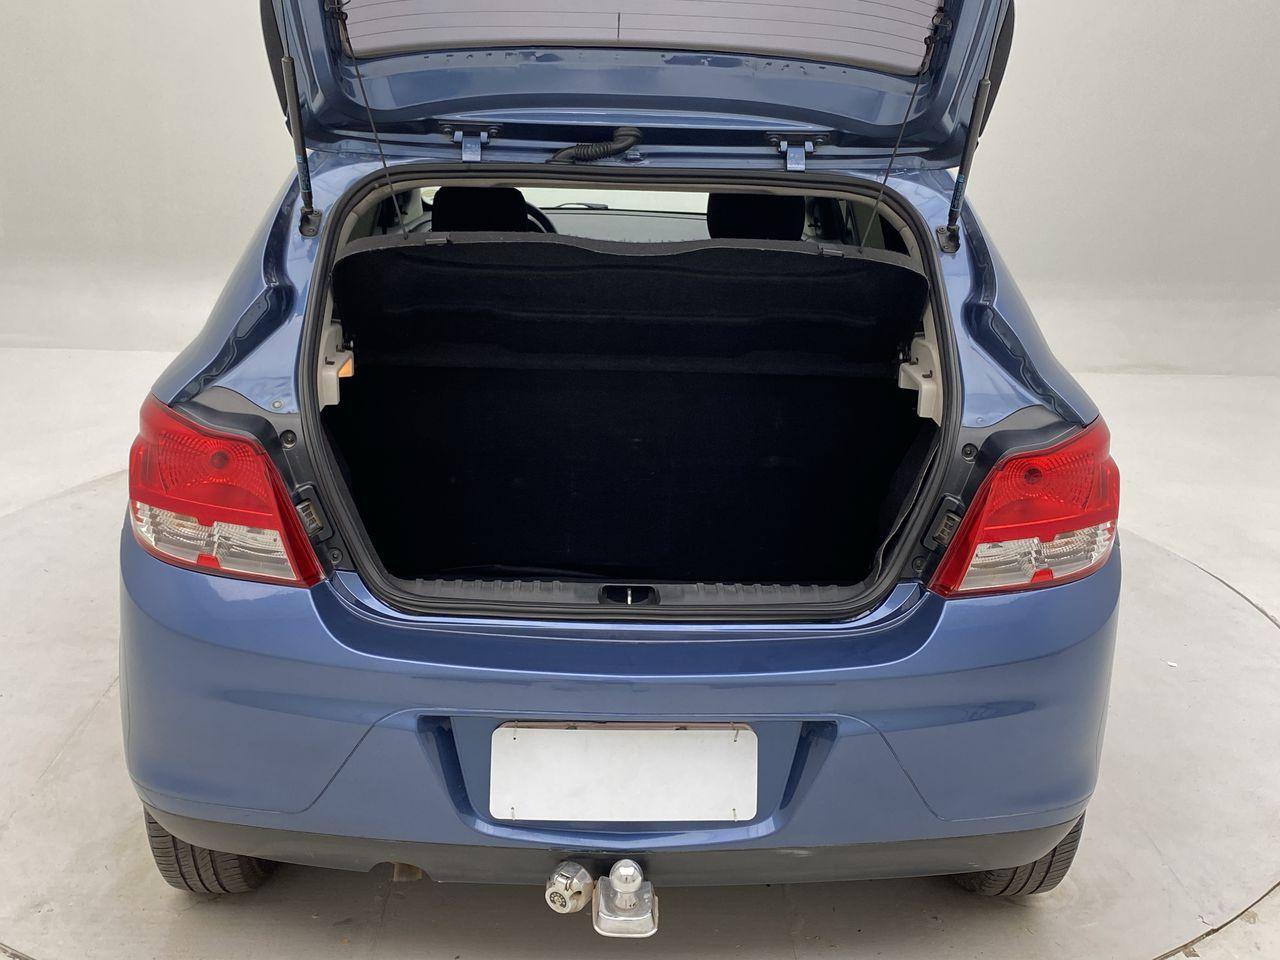 onix hatch lt 1.0 8v flexpower 5p mec.